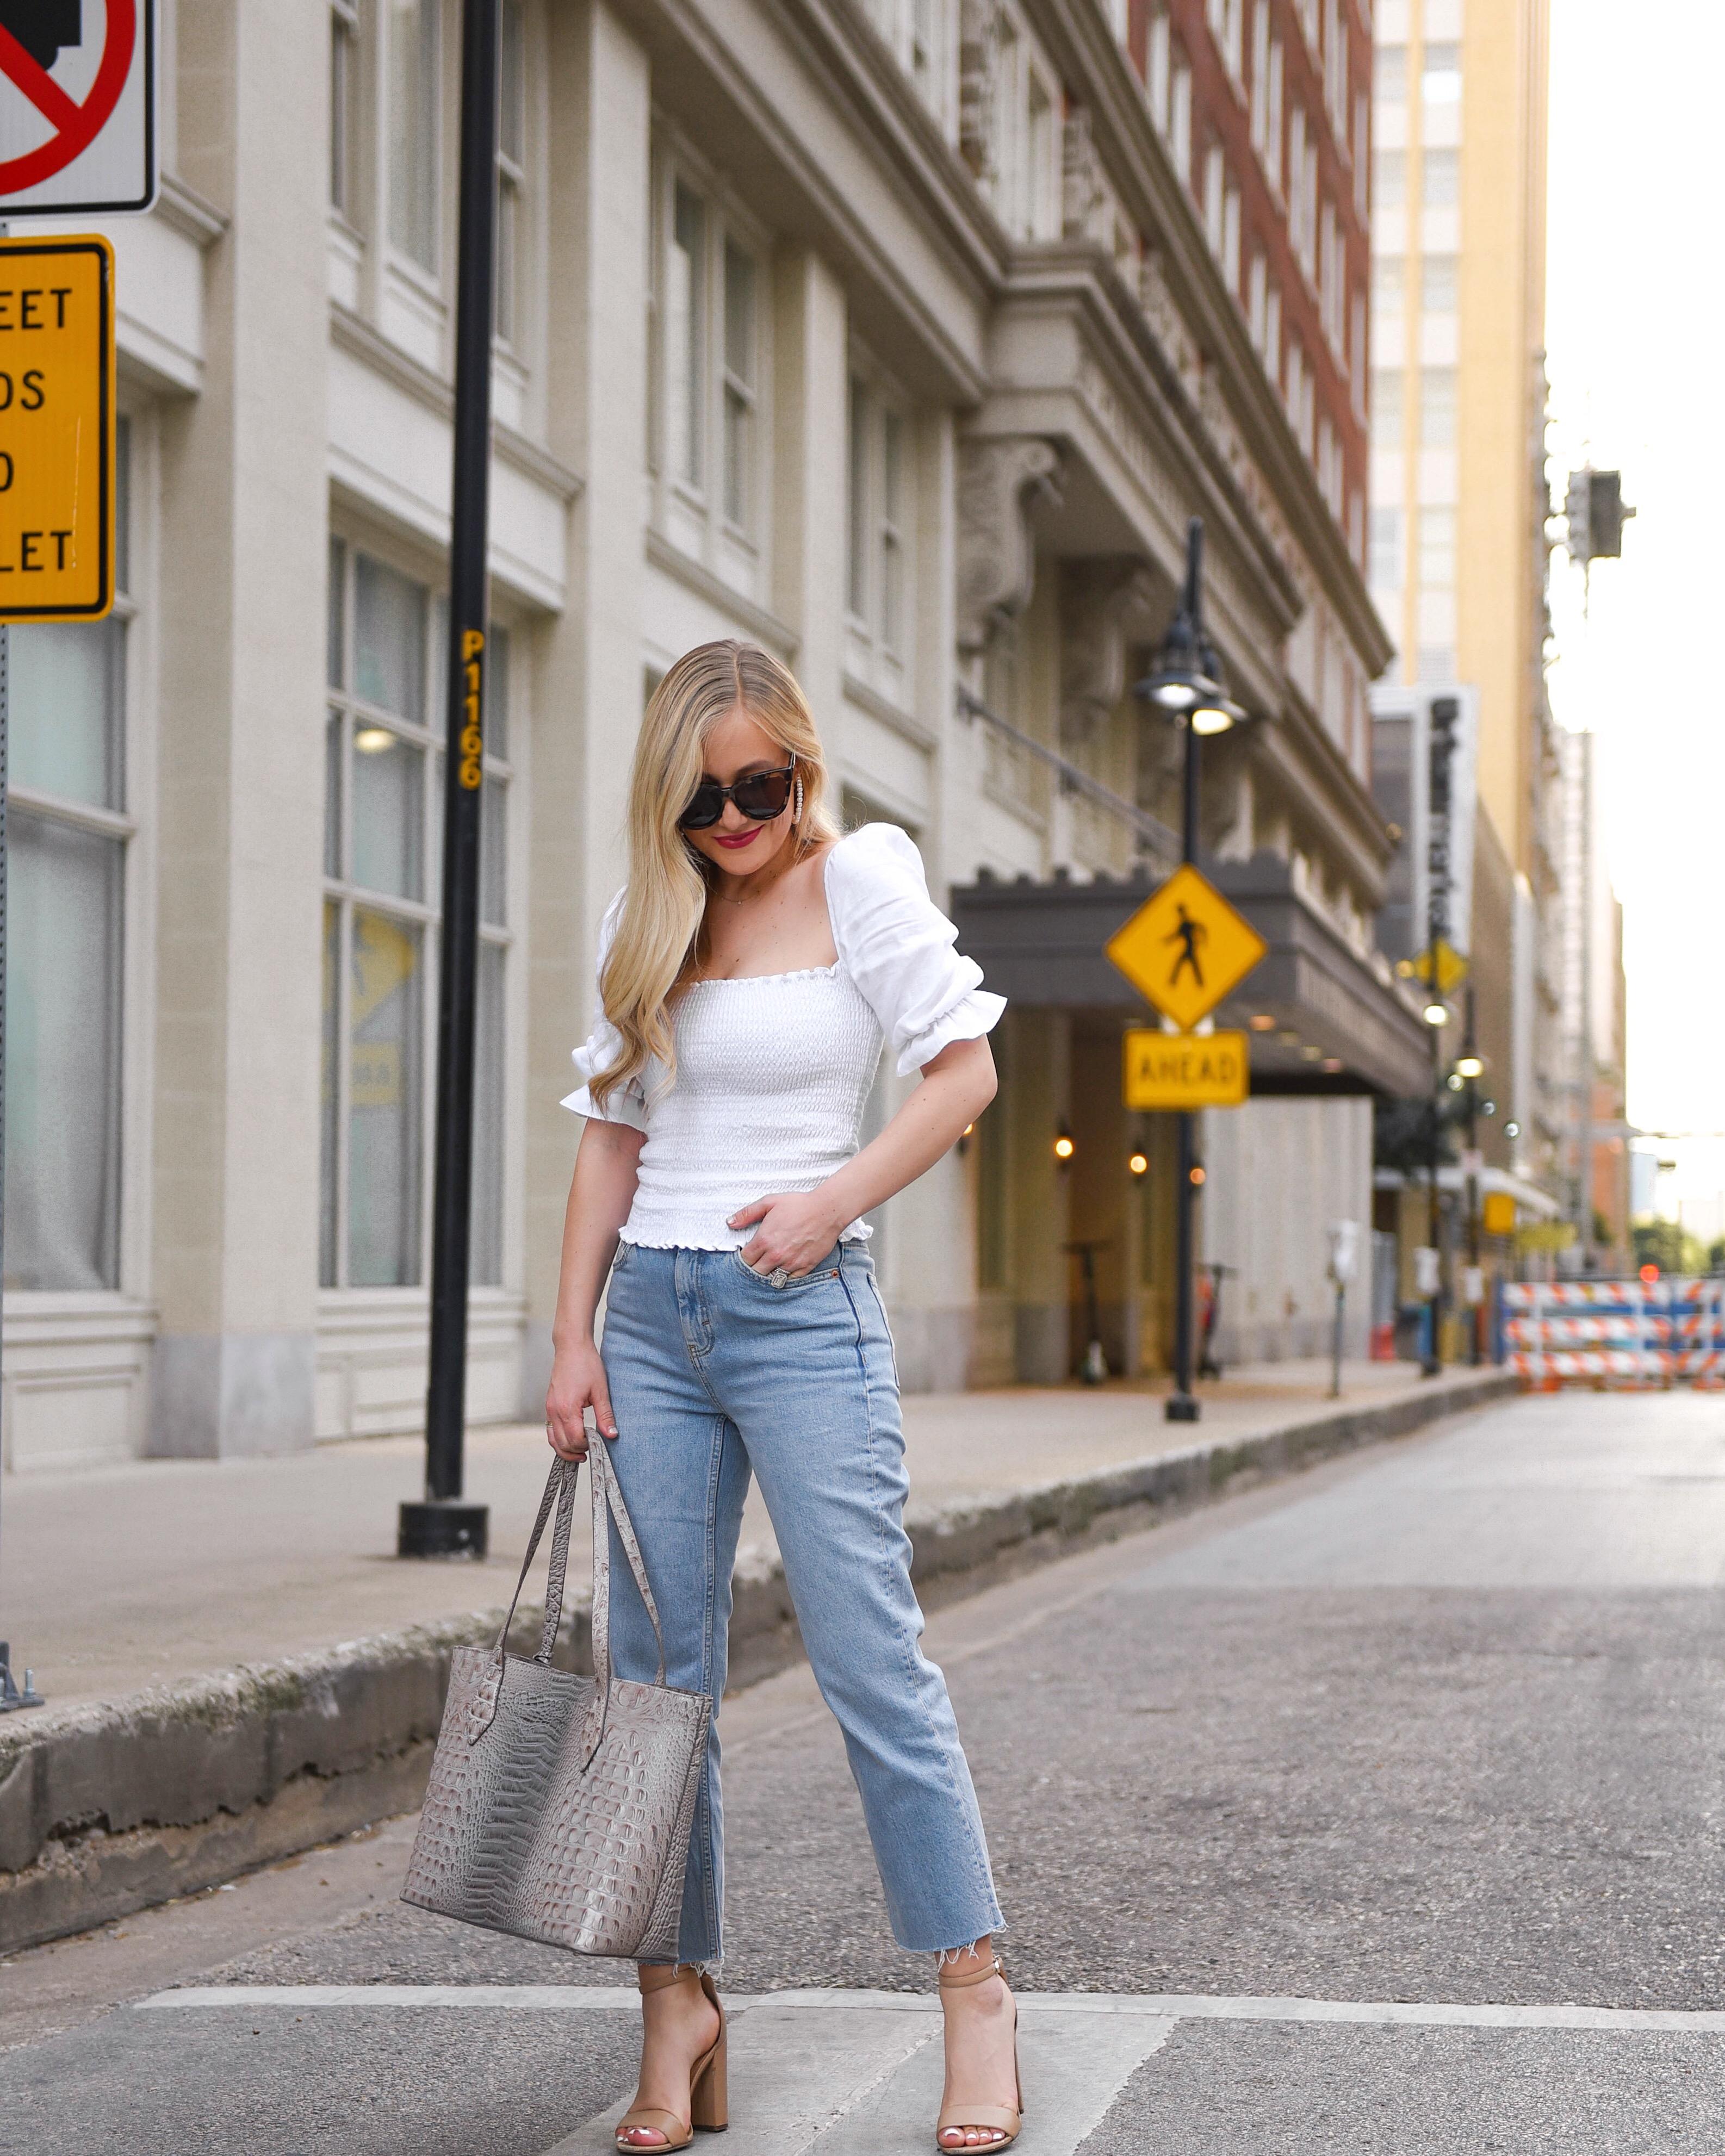 Lo-Murphy-Brahmin-Tote-Bag-Designer-Handbag-Casual-street-style-Dallas-Blogger